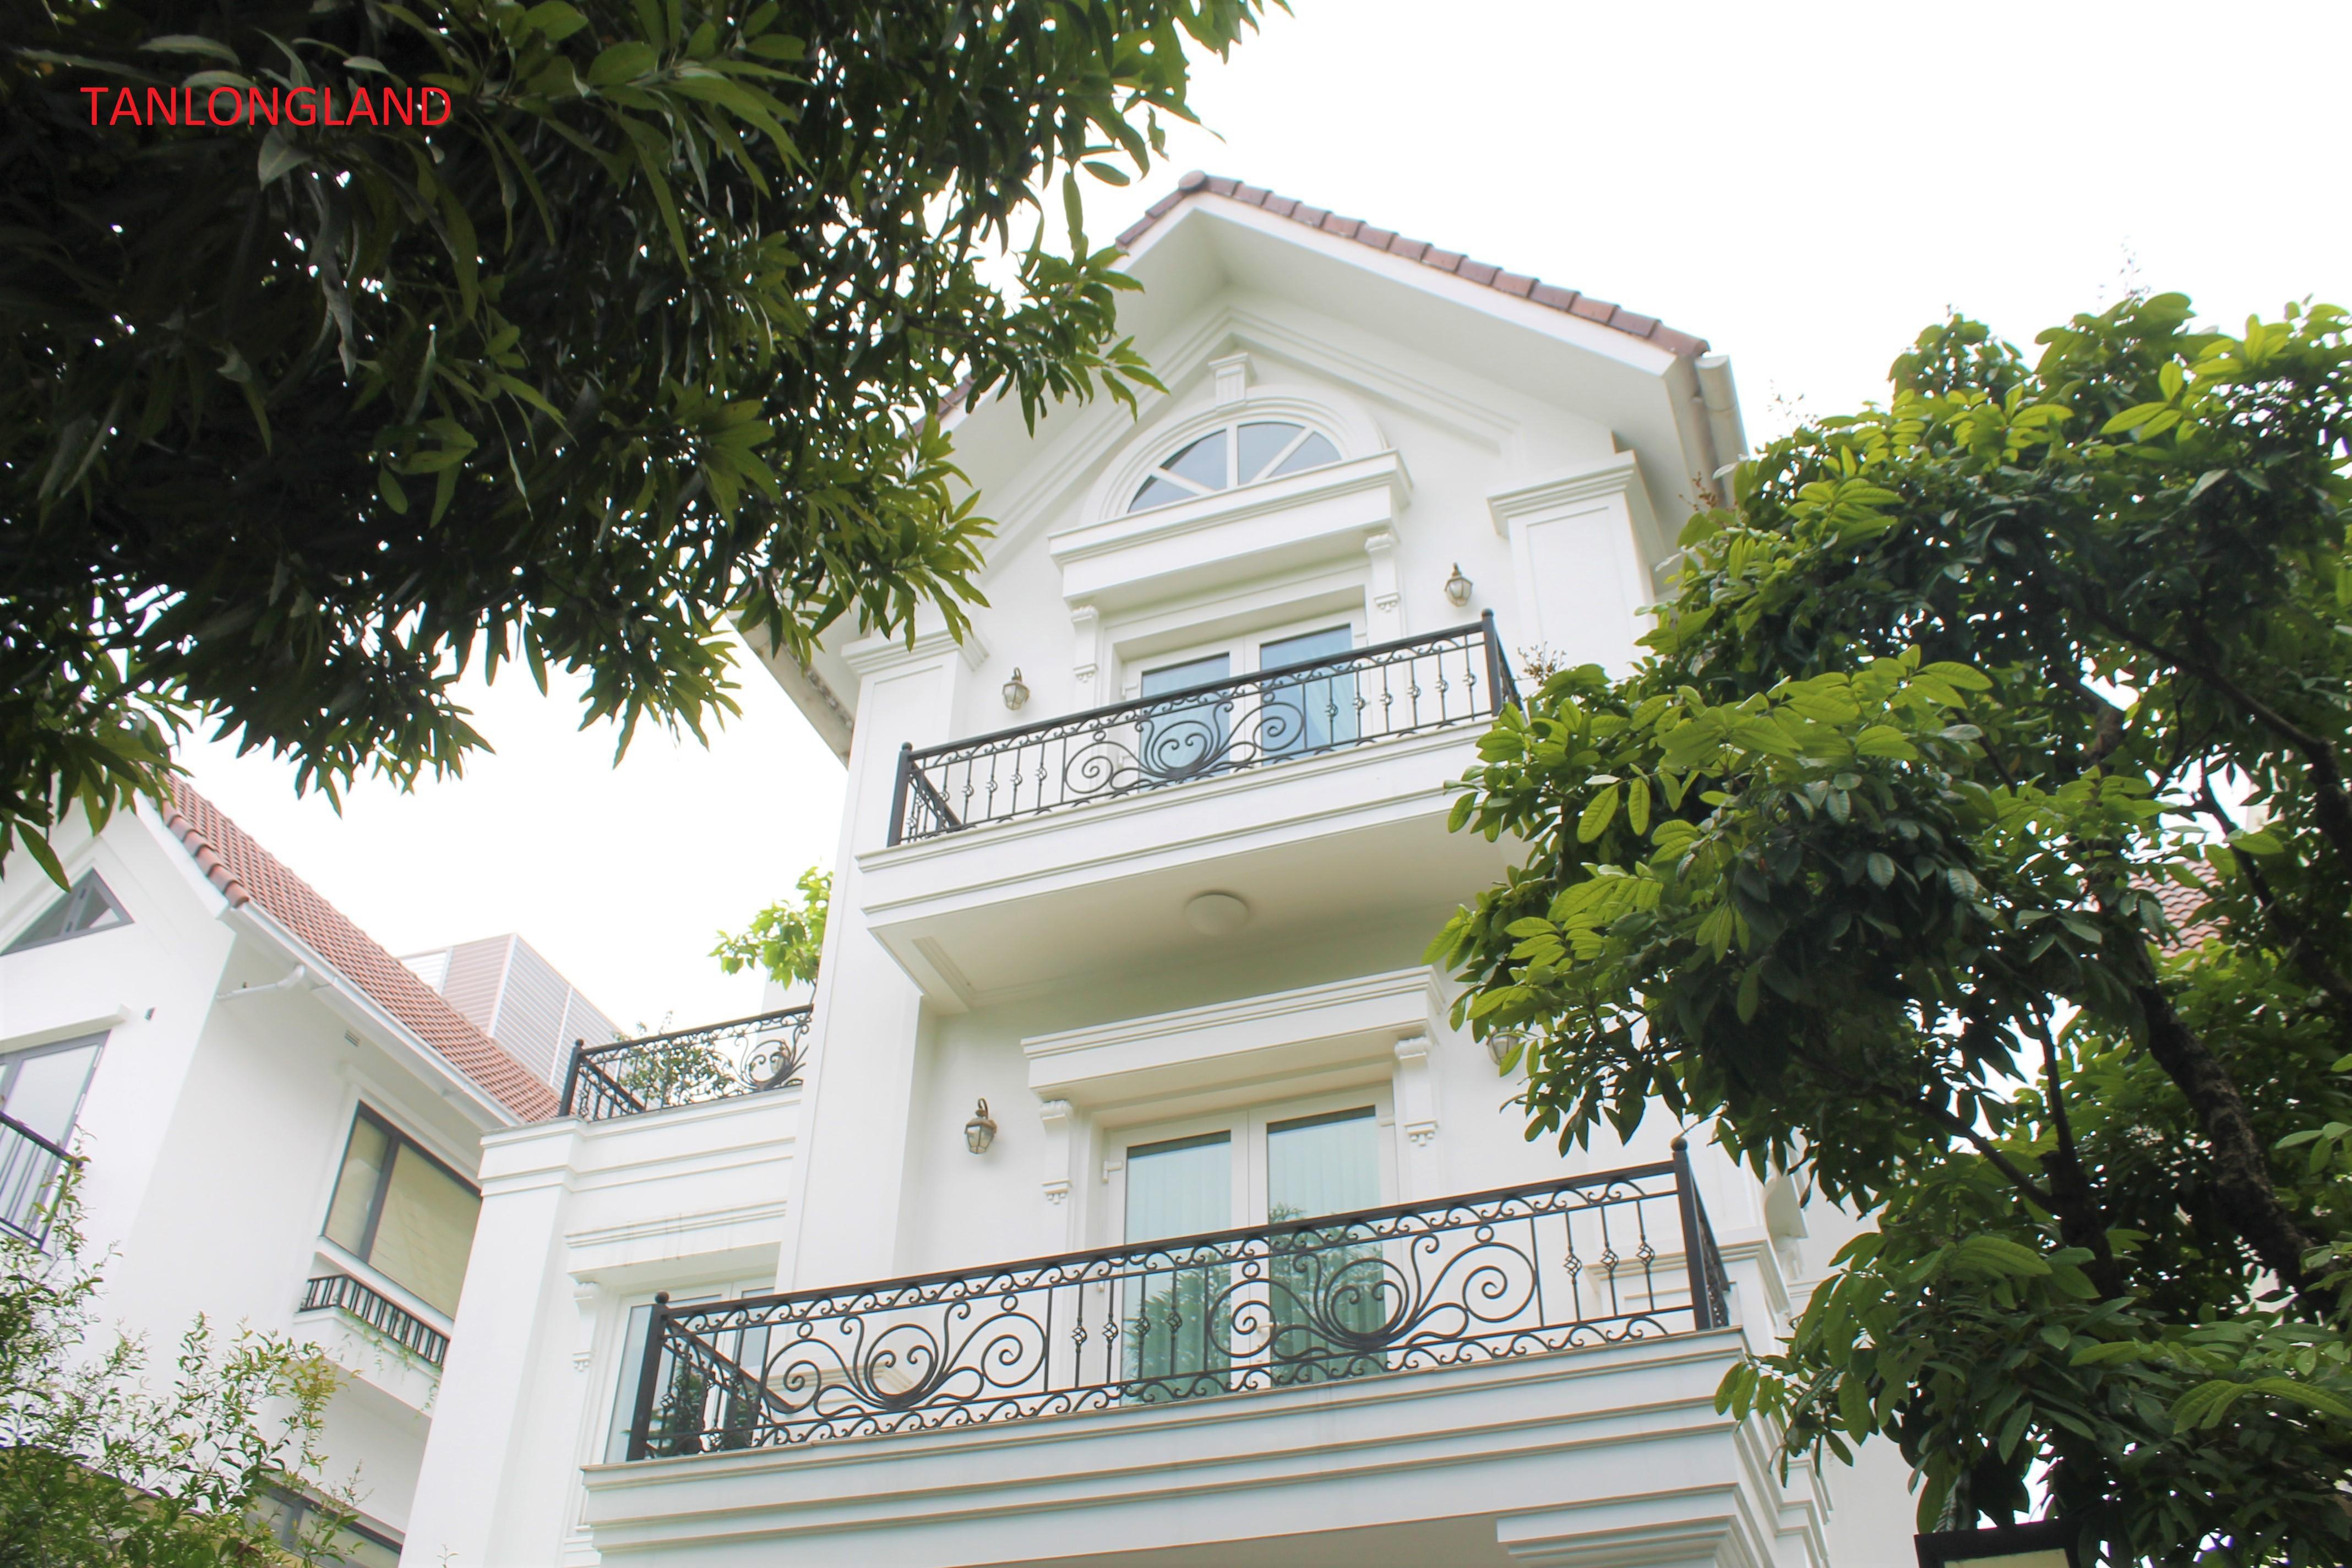 Vinhomes Riverside Villas/ Houses in Long Bien - Venice city of Hanoi